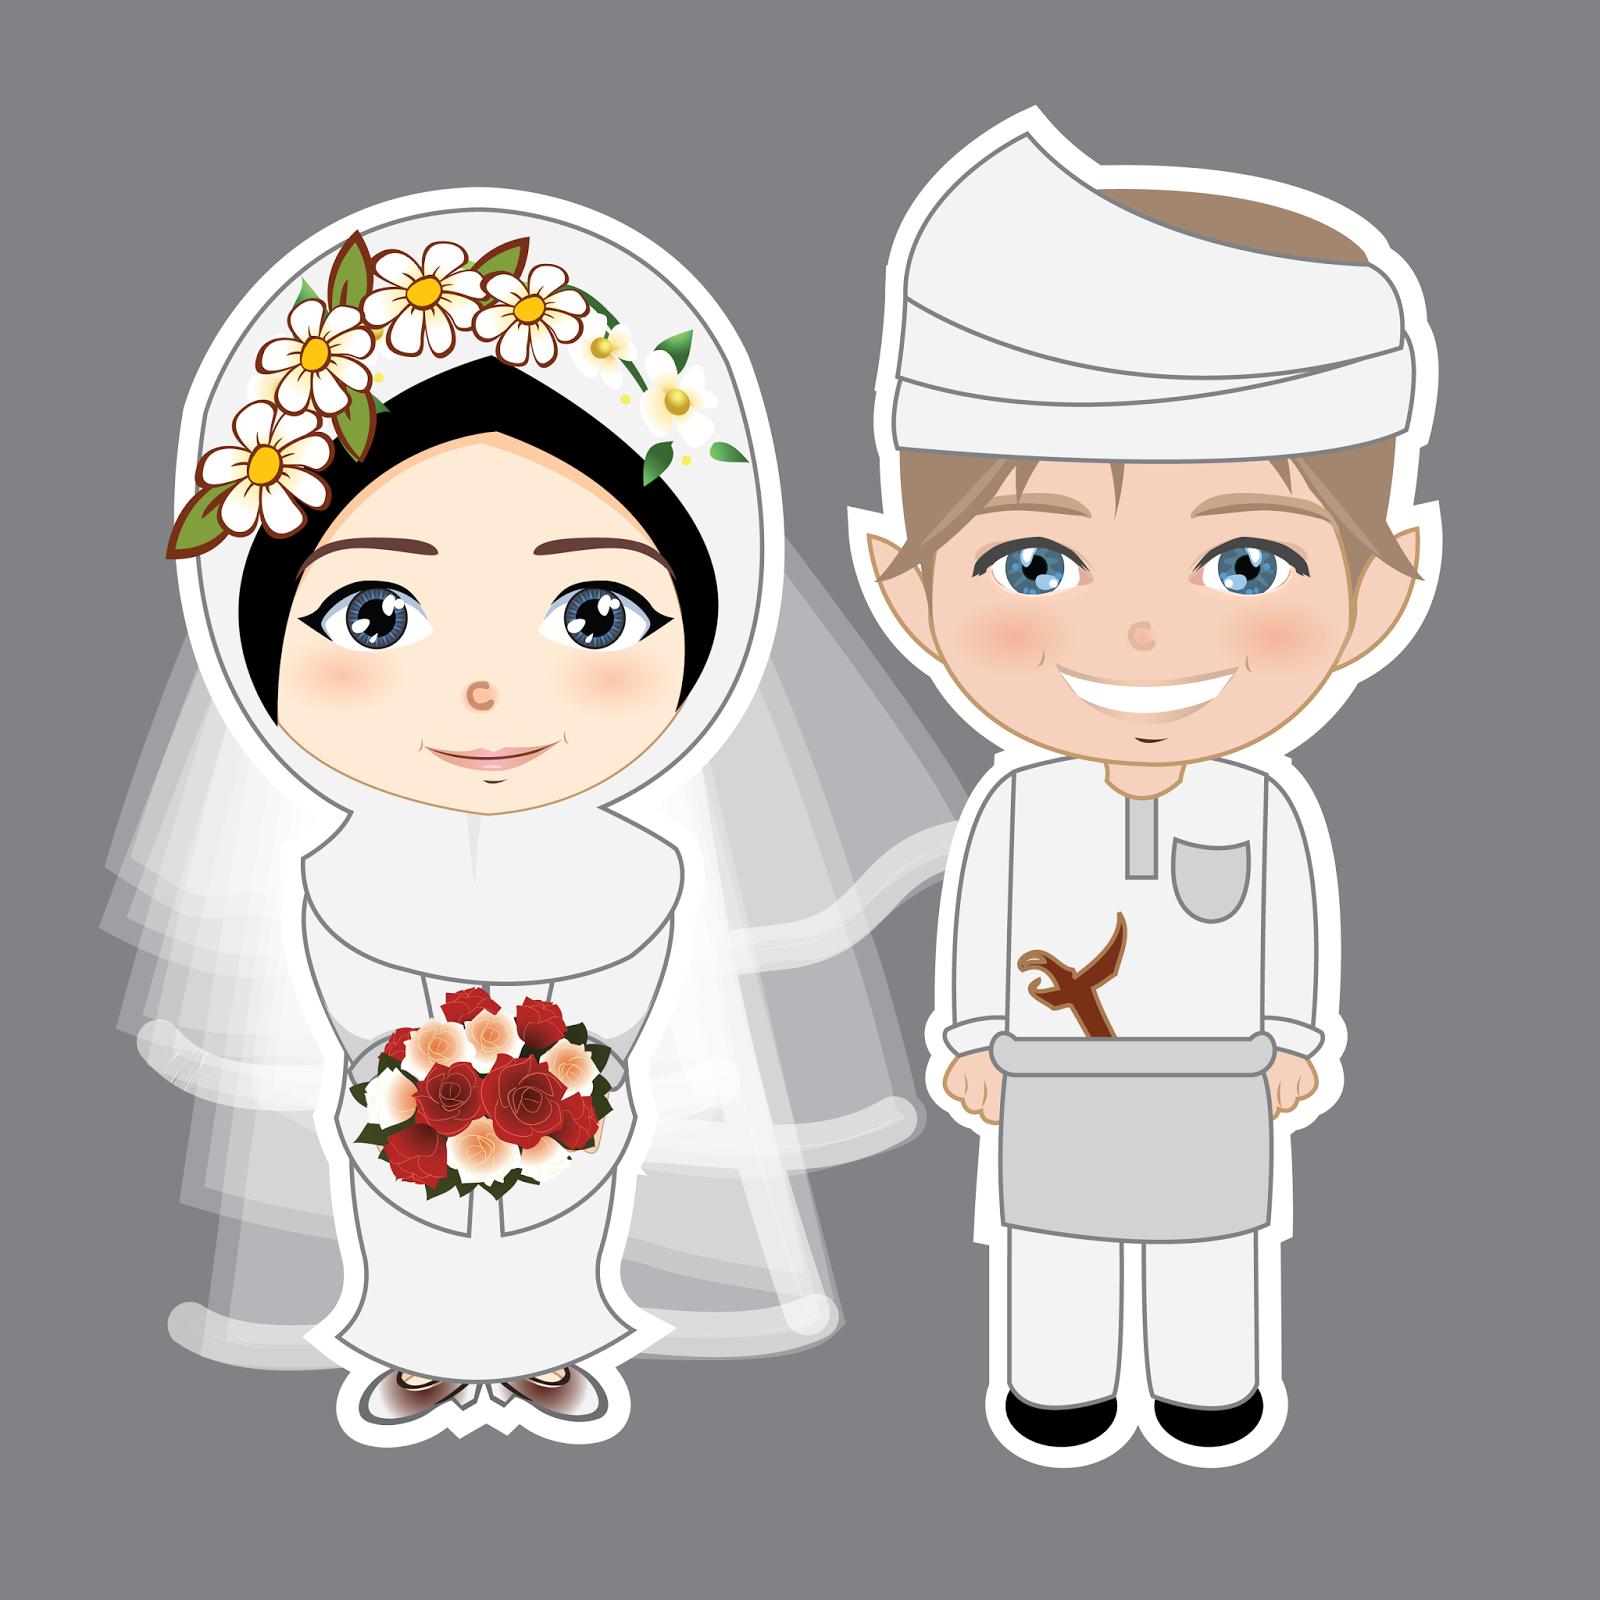 Animasi Undangan Pernikahan